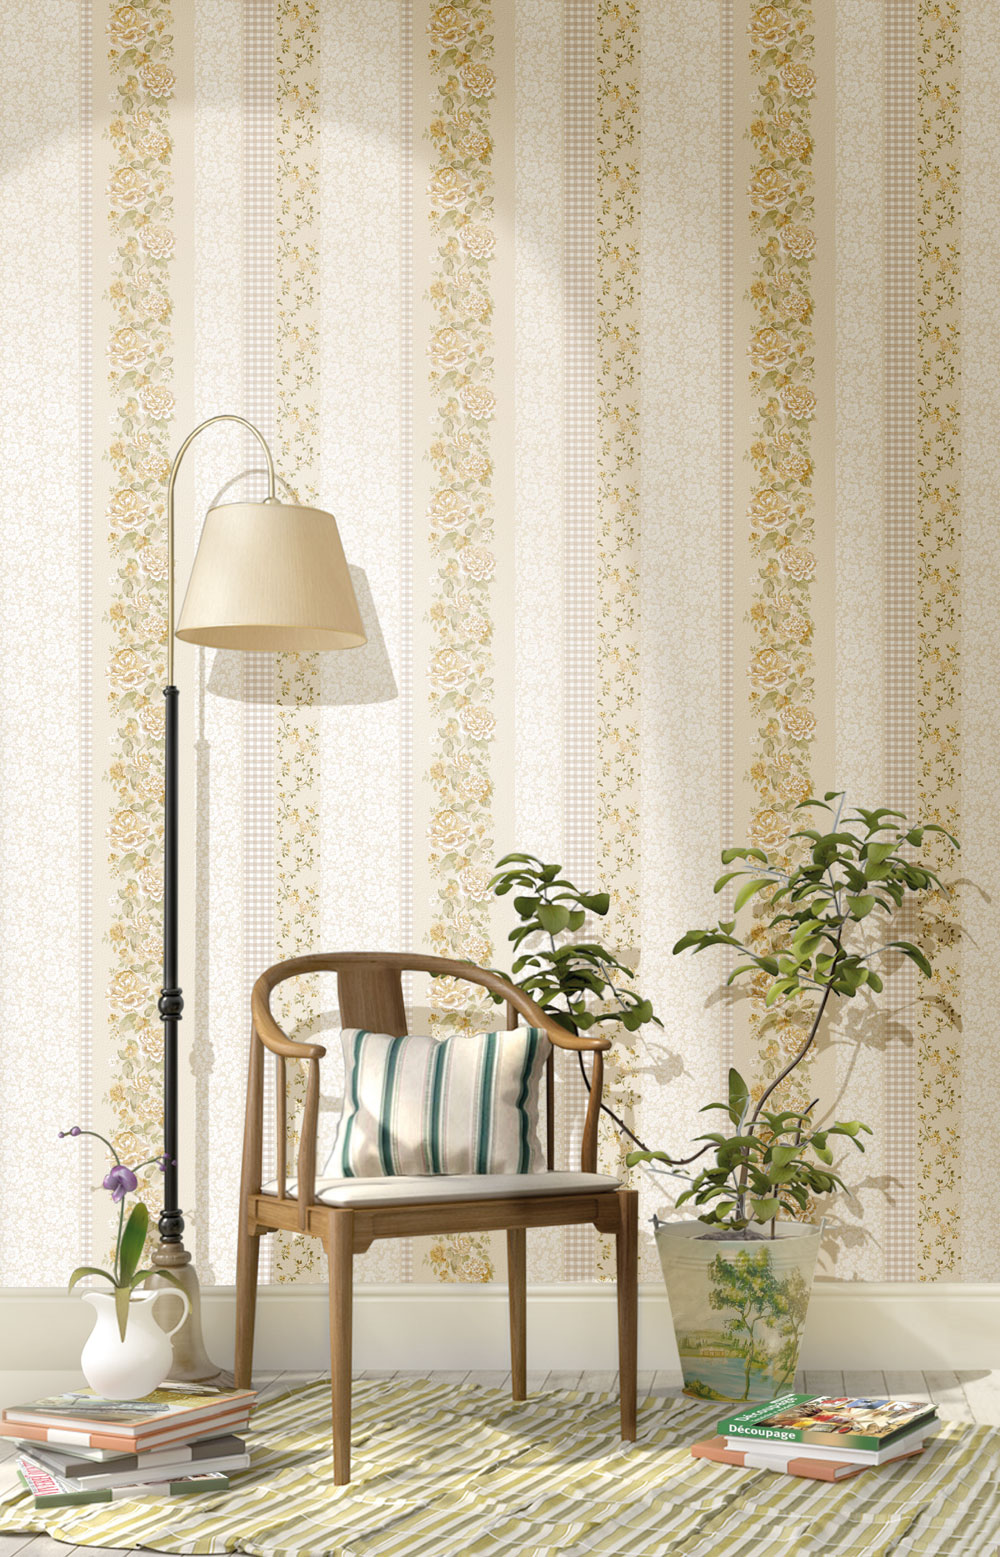 2538 primavera tapete landhaus streifen karo blumenranken ebay. Black Bedroom Furniture Sets. Home Design Ideas